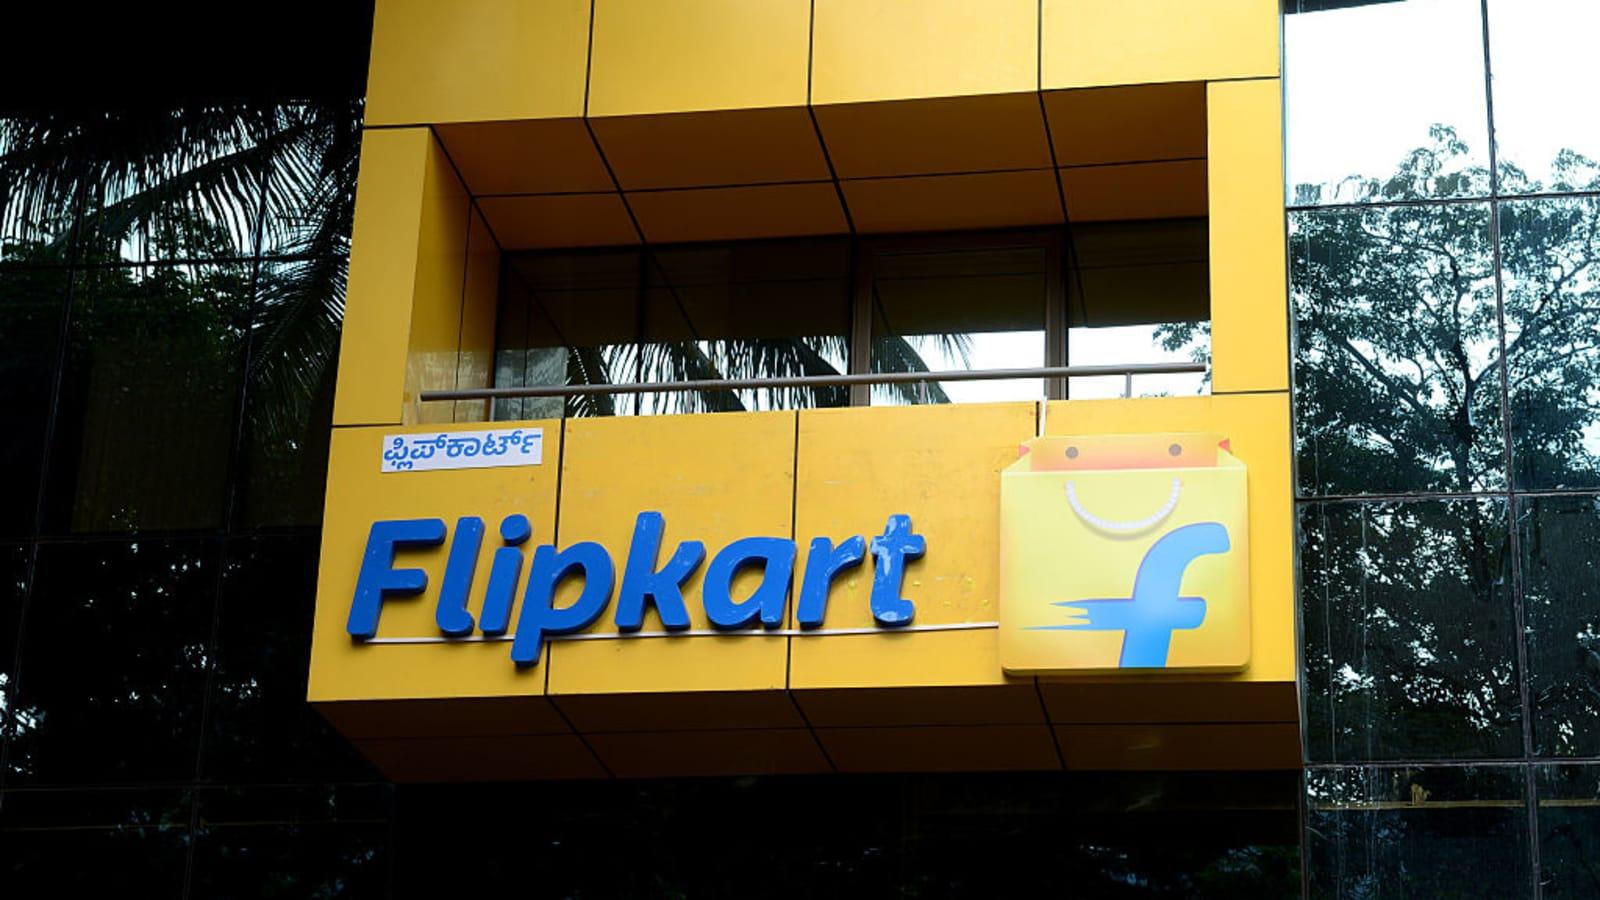 Linkedin Top Companies To Work For In India 2019 Flipkart Amazon Oyo